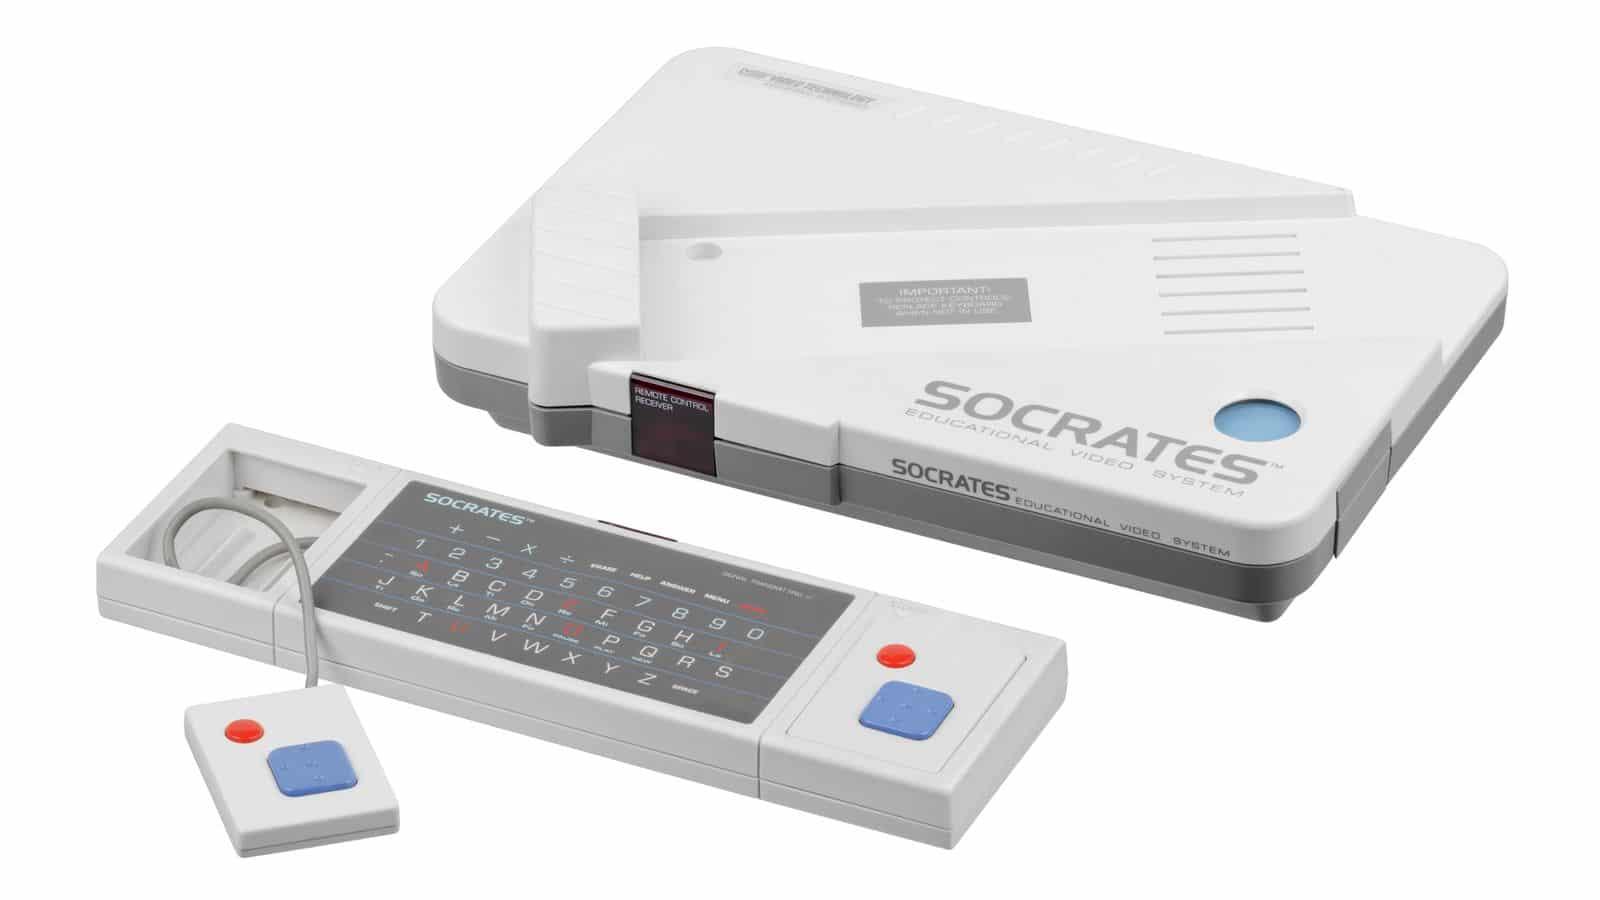 socrates game console